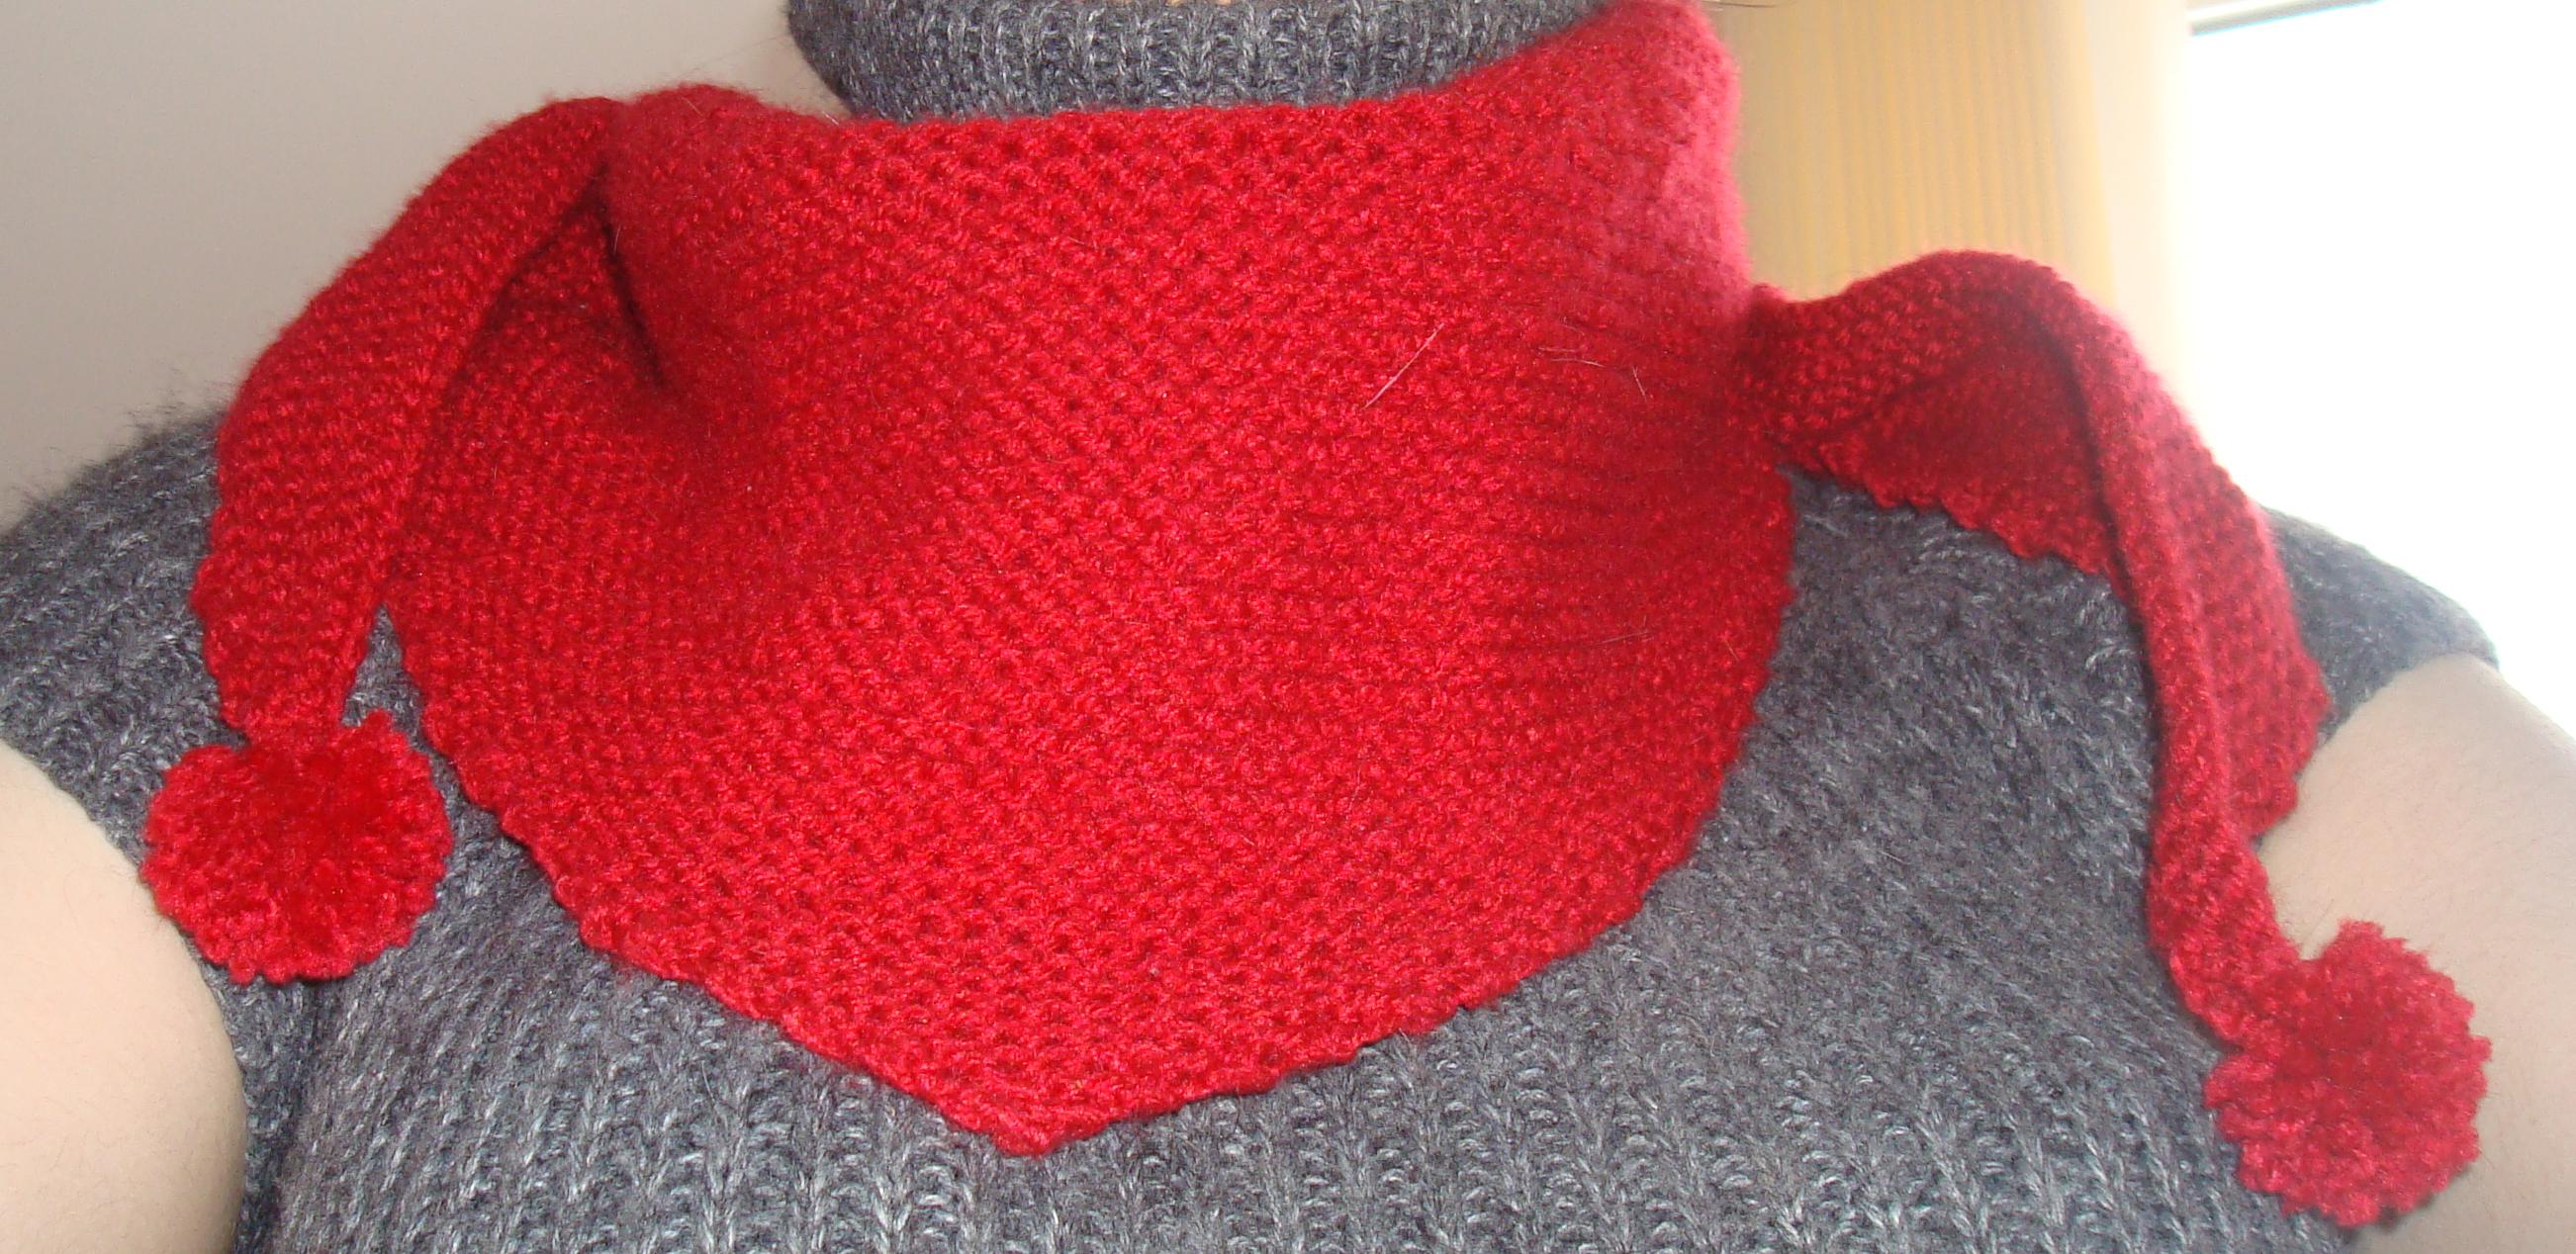 Tricoter un foulard en triangle - Cote 2 2 tricot ...